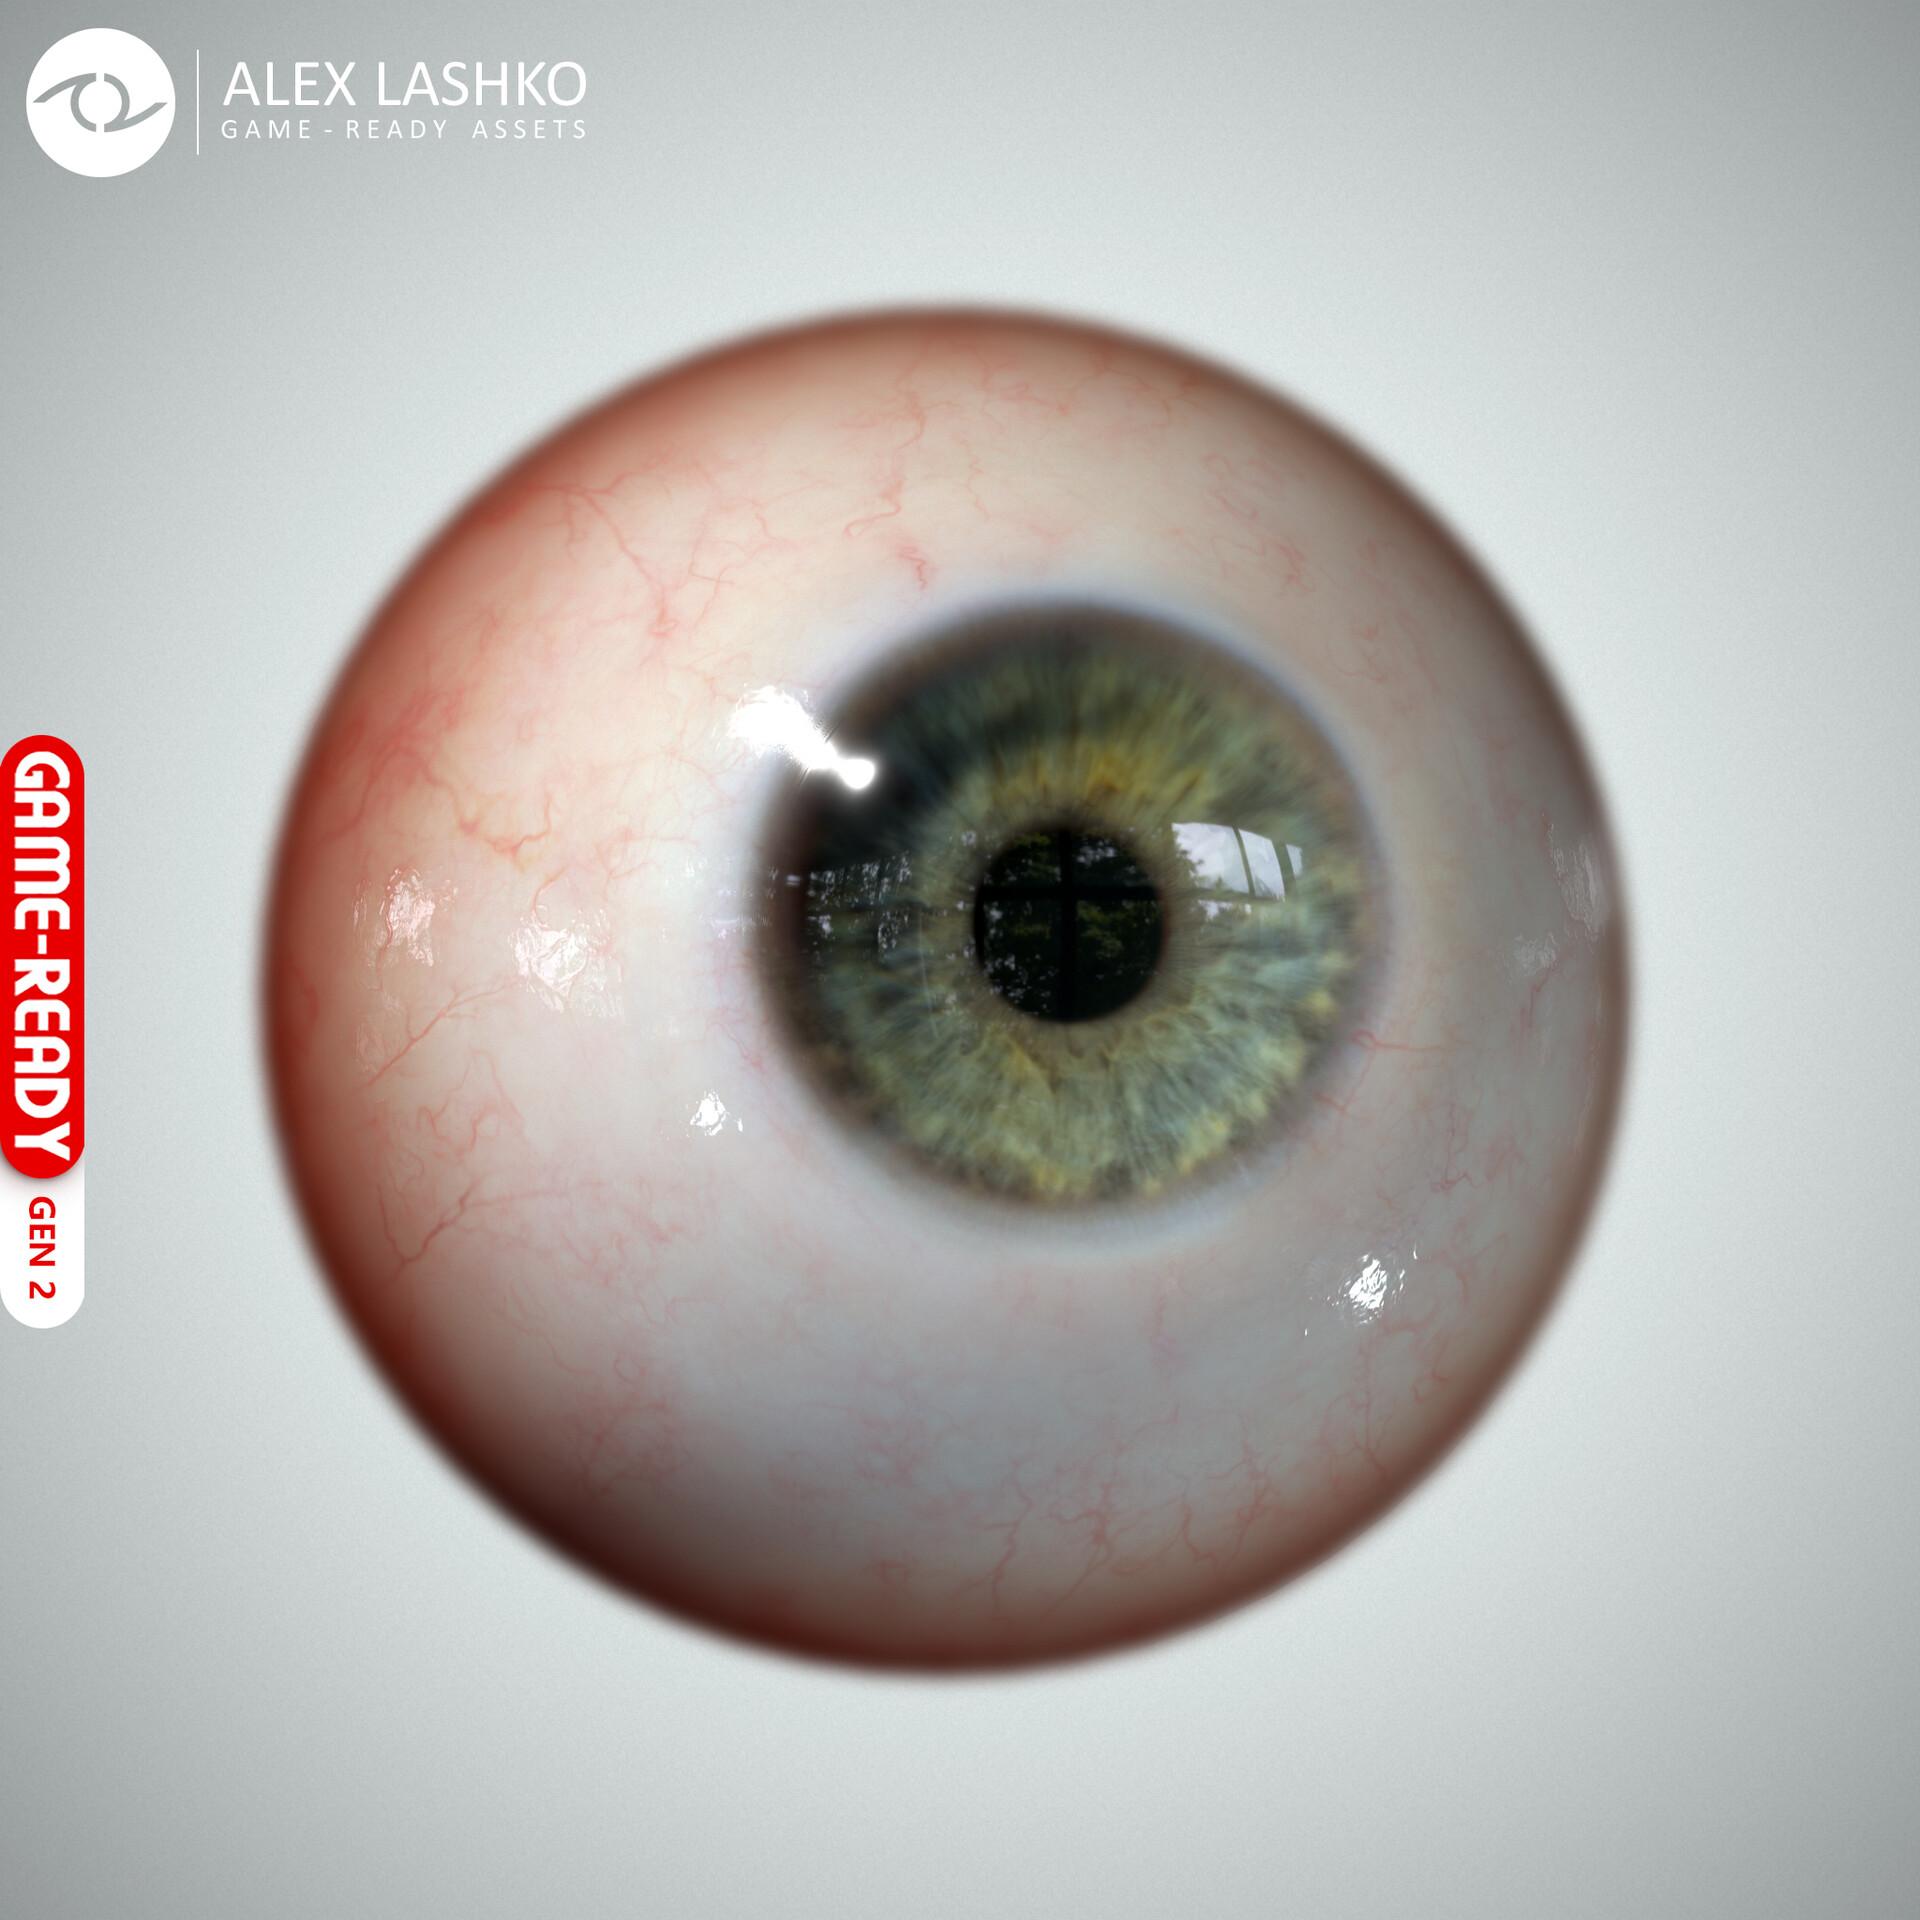 Alex lashko eyeball gen2 by alexlashko 00